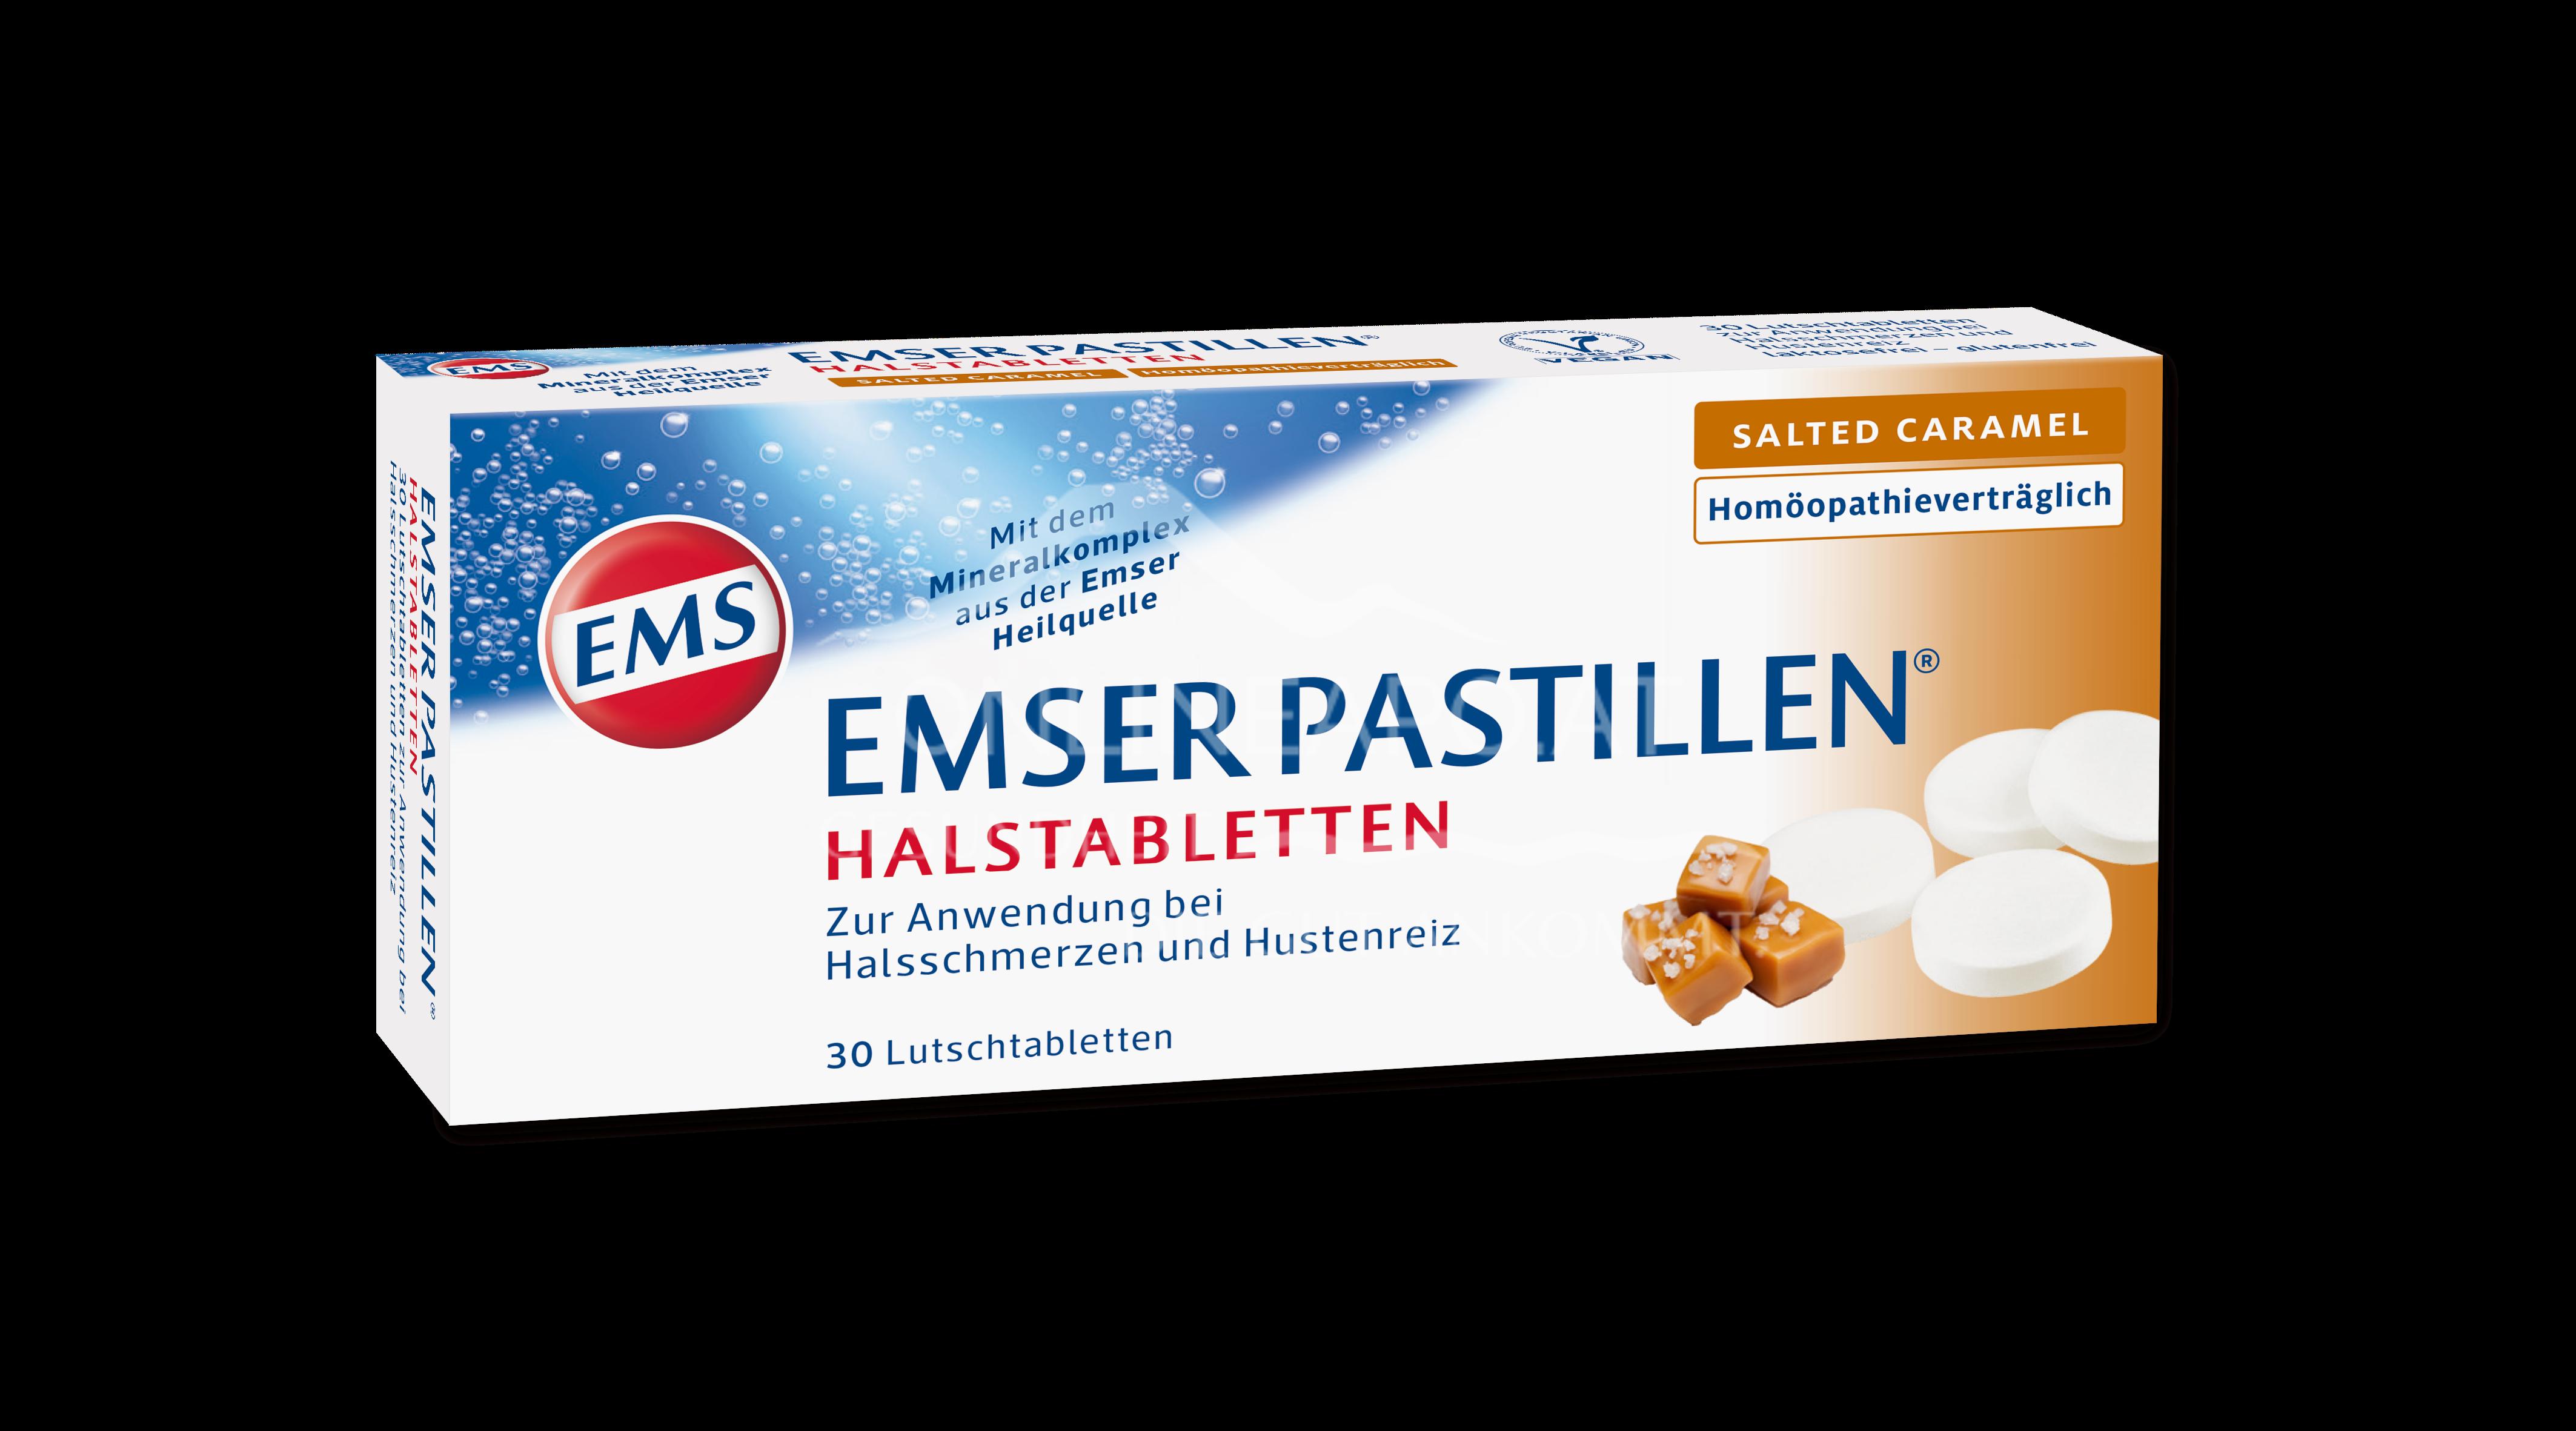 Emser Pastillen® Halstabletten Salted Caramel